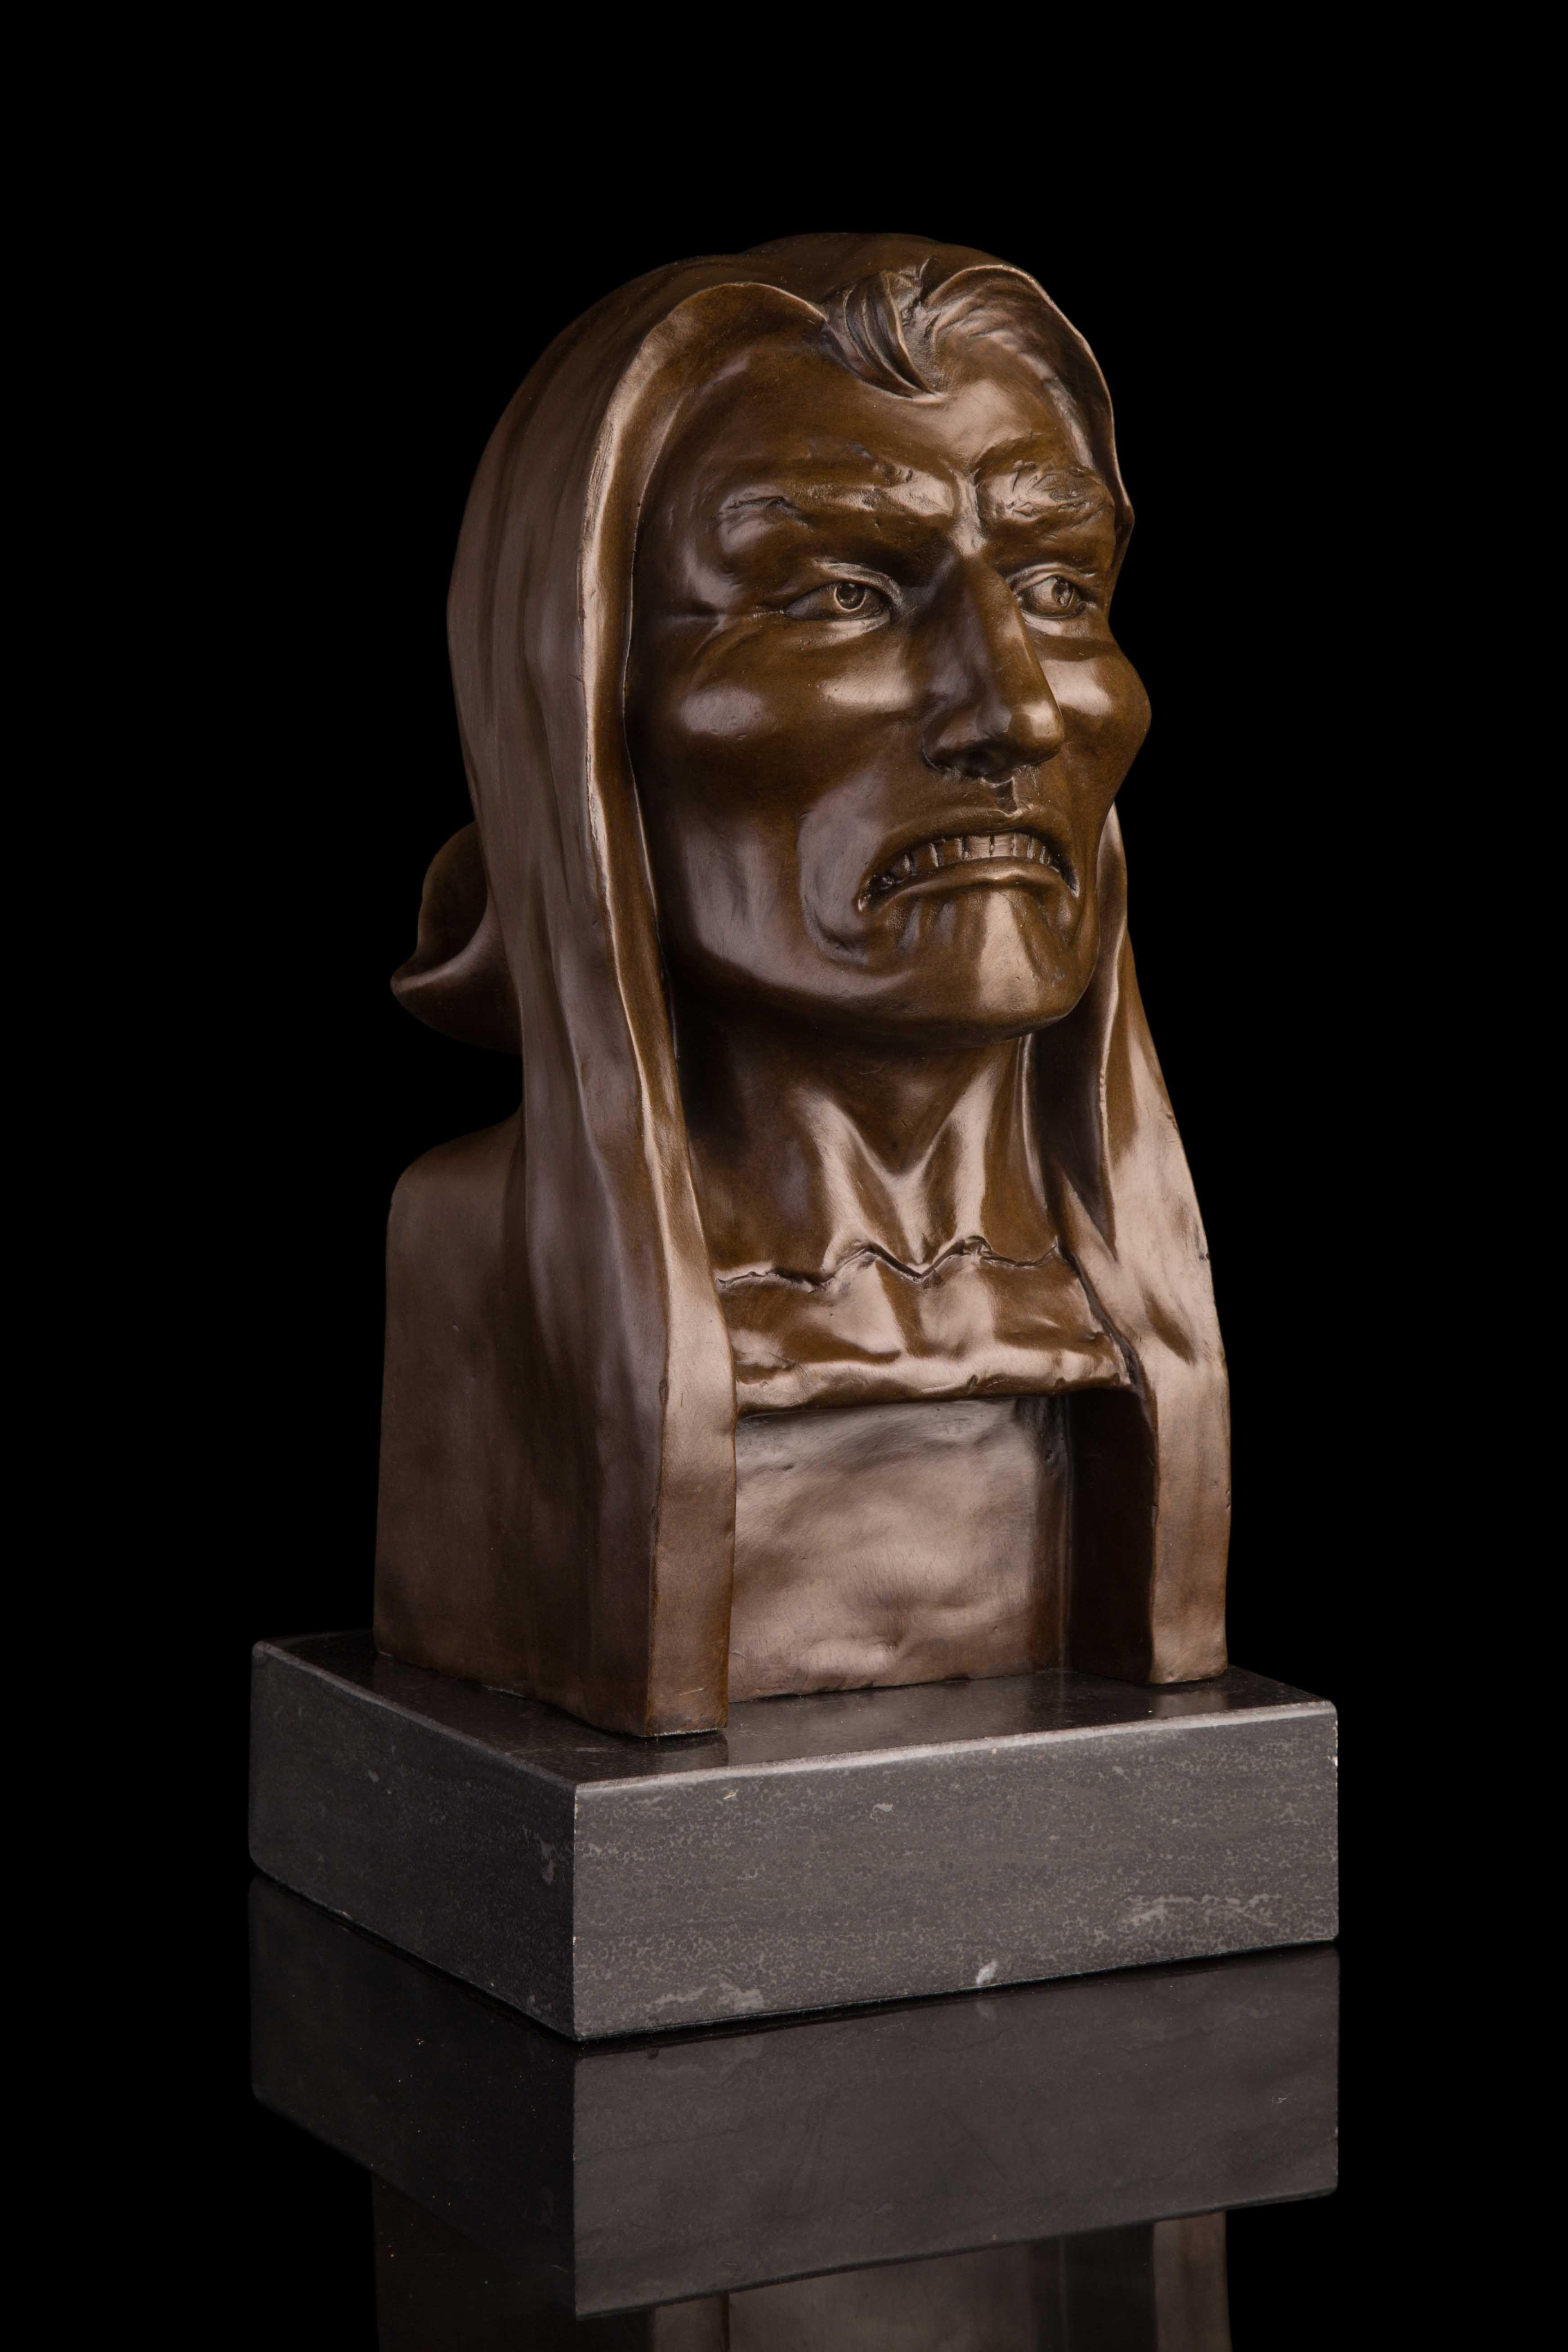 Wo copper studio art figure statues sculpture for home modern exhibition hall soft decoration struggles